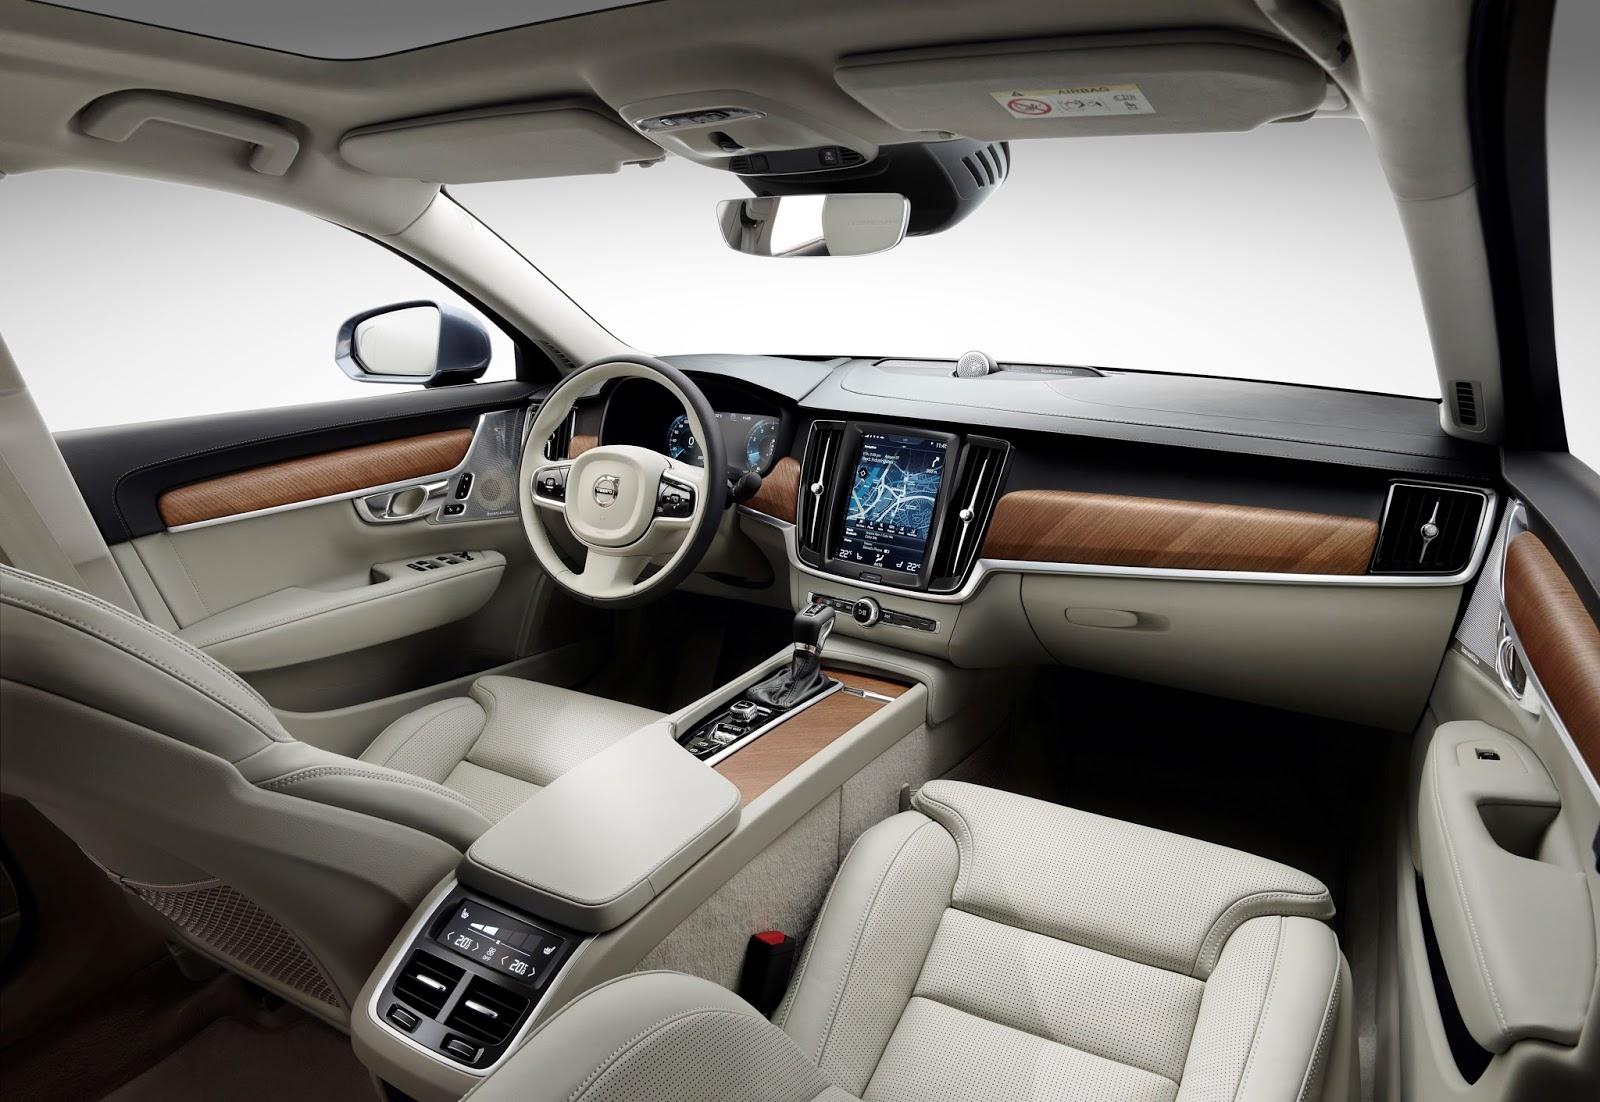 170161 Interior cockpit Volvo S90 V90 blond Το V90 είναι το πιο όμορφο, το πιο ασφαλές station wagon και το πιο... Volvo Station Wagon, Volvo, Volvo V90